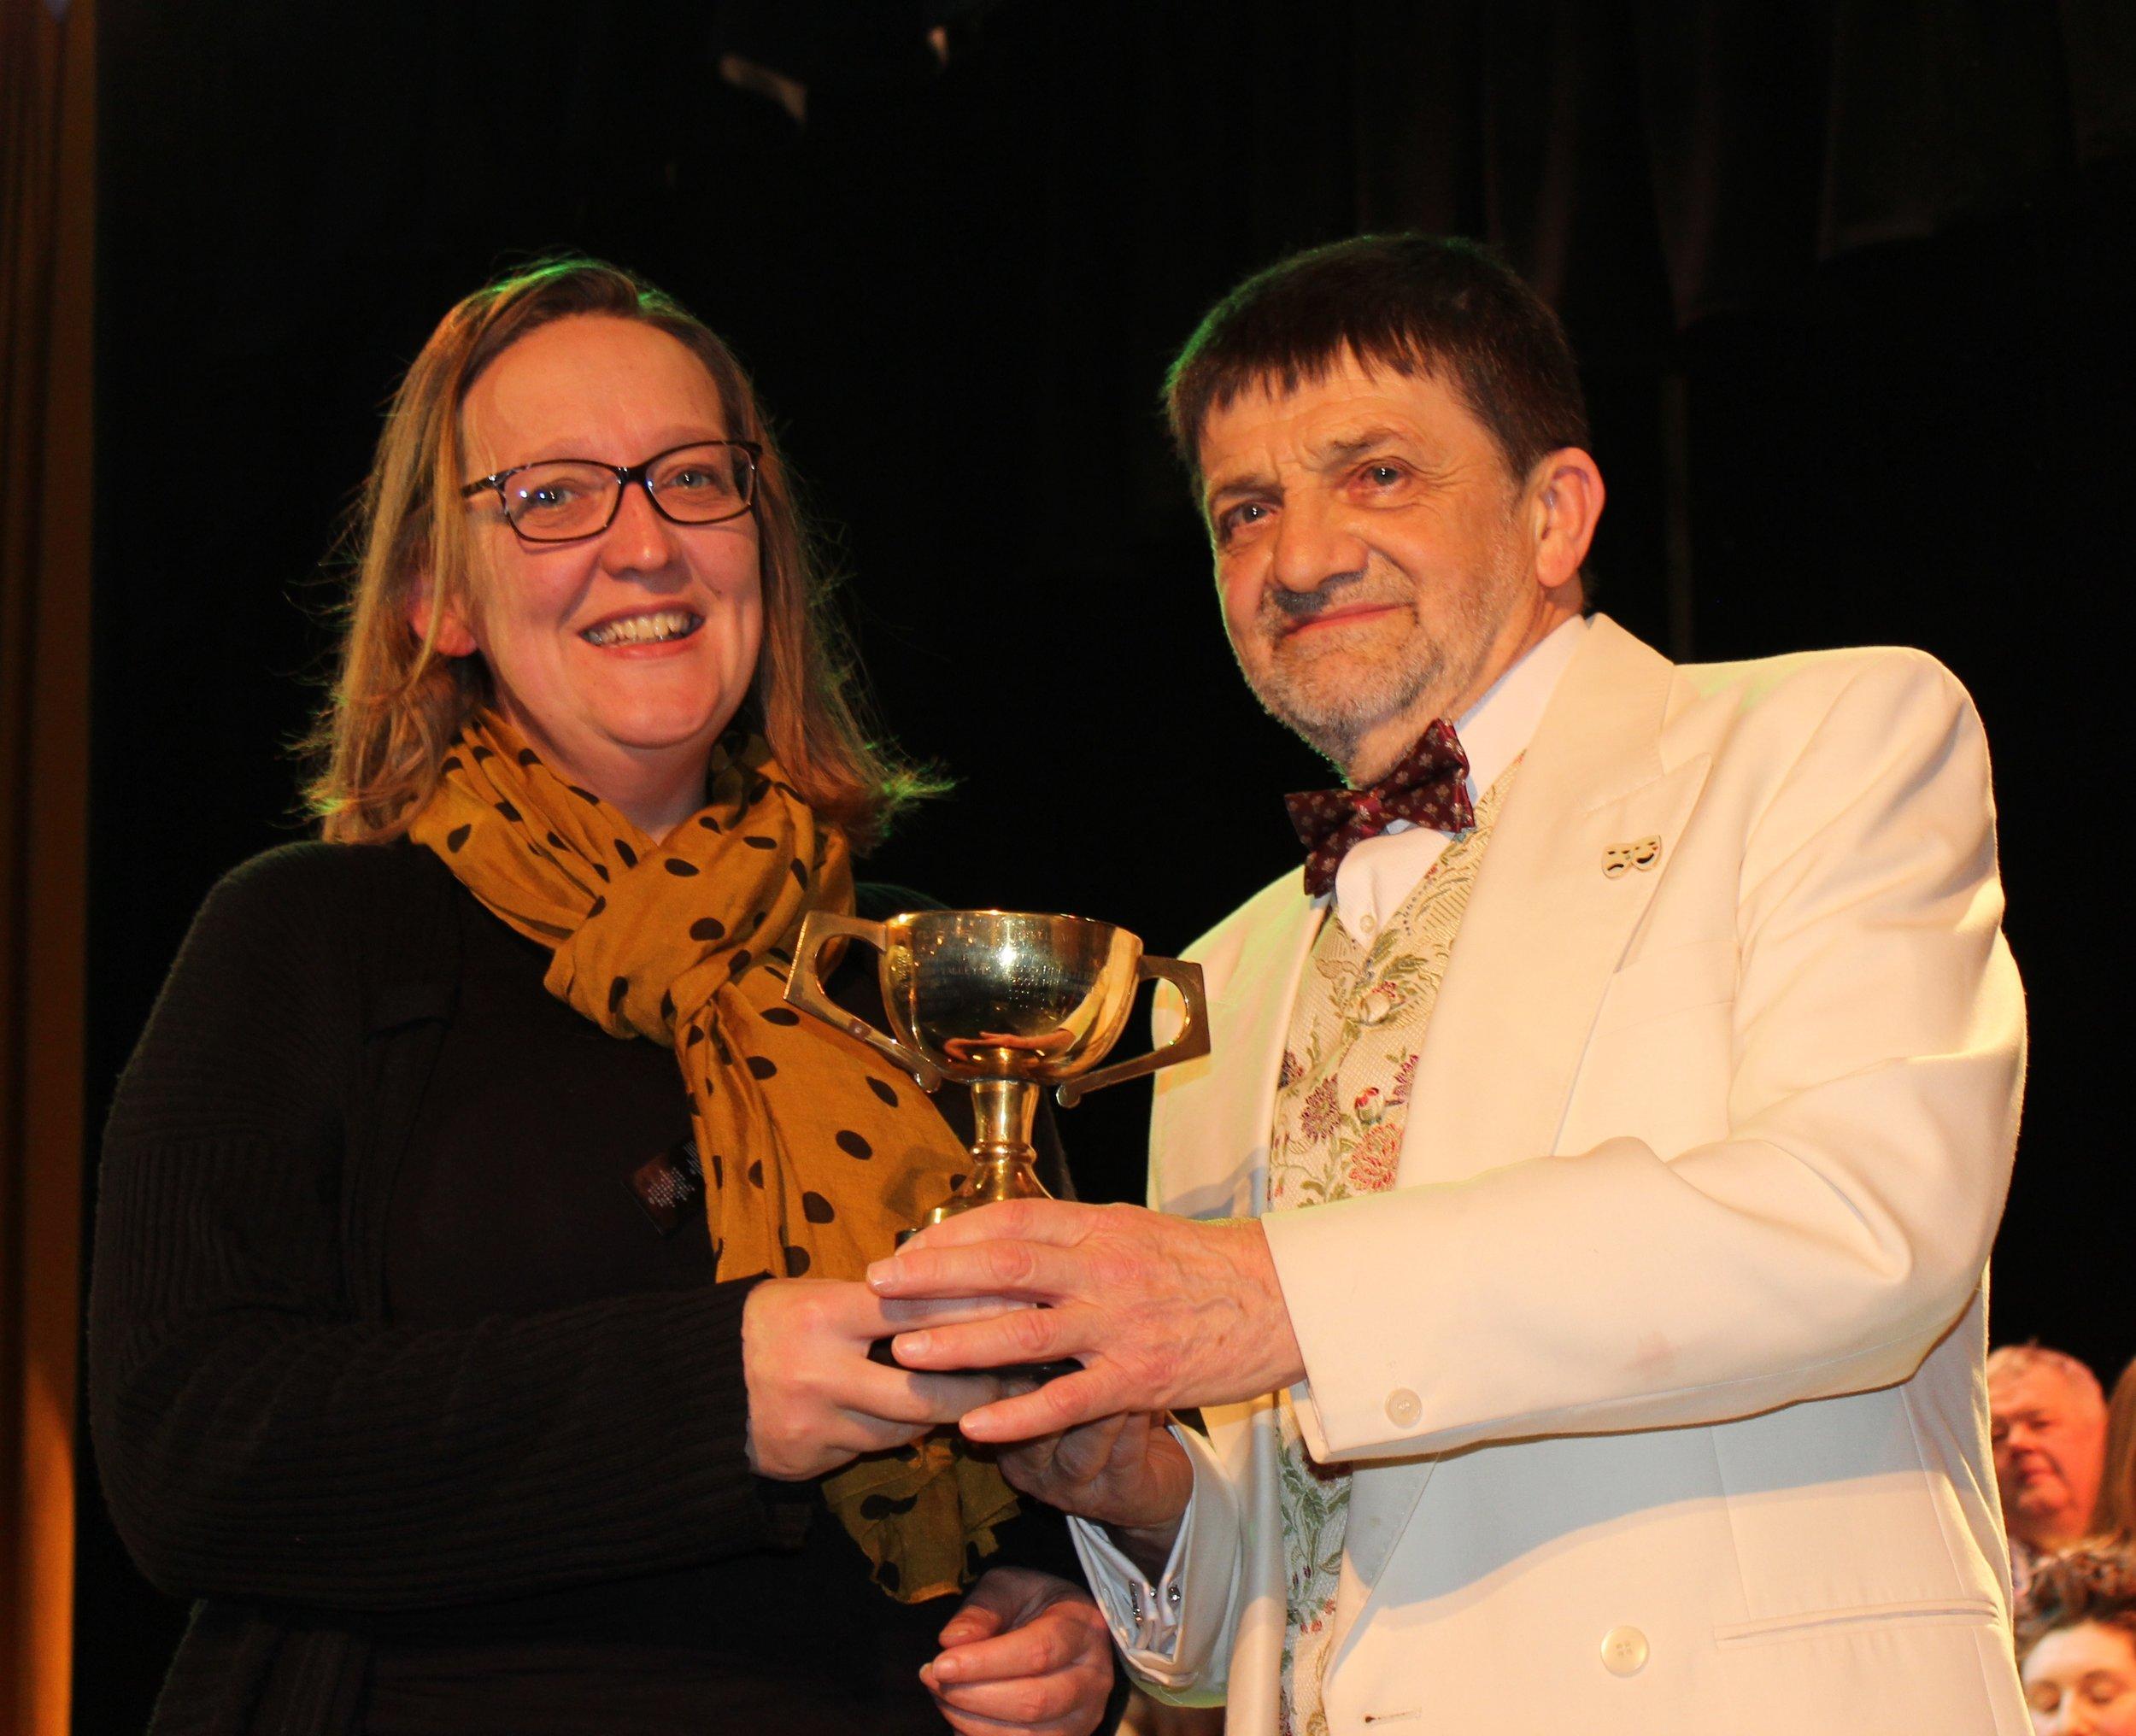 Jenna Smith, Howey YFC with Entertainment Adjudicator Mr Ian Sarginson - Tom Hooson Cup for Highest Place Smallest Club.